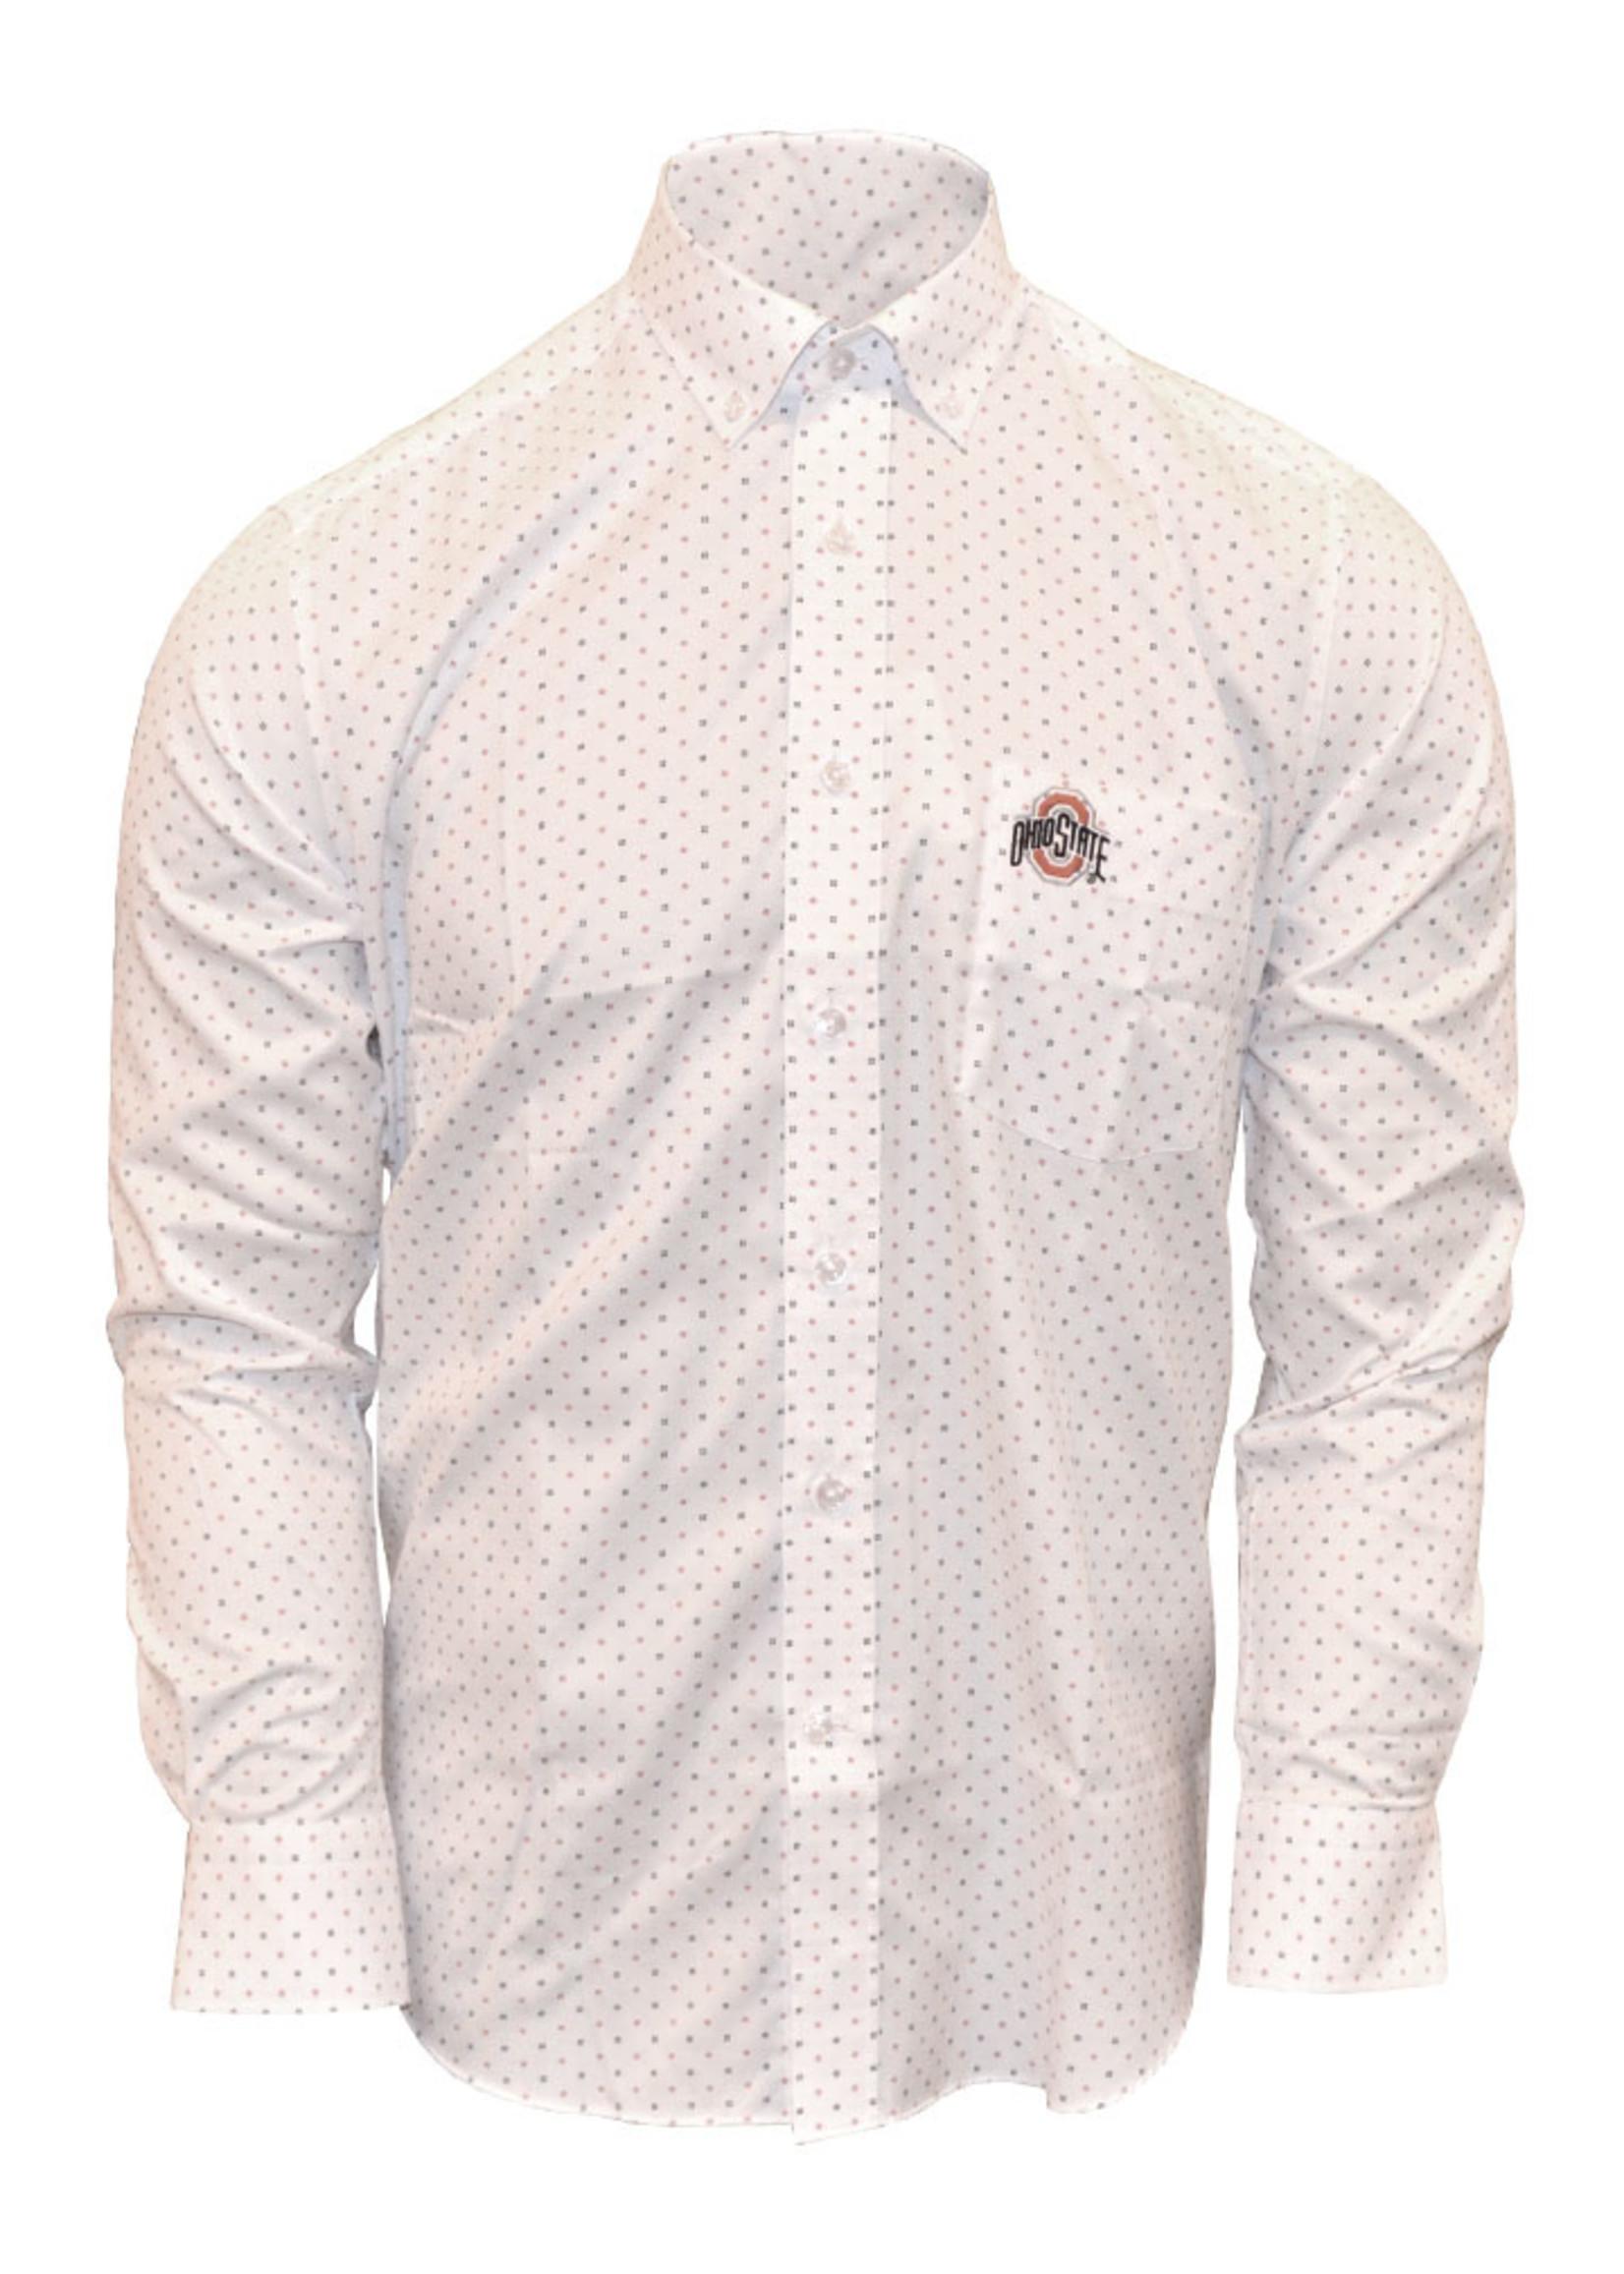 Ohio State Buckeyes Polka Dot Dress Shirt